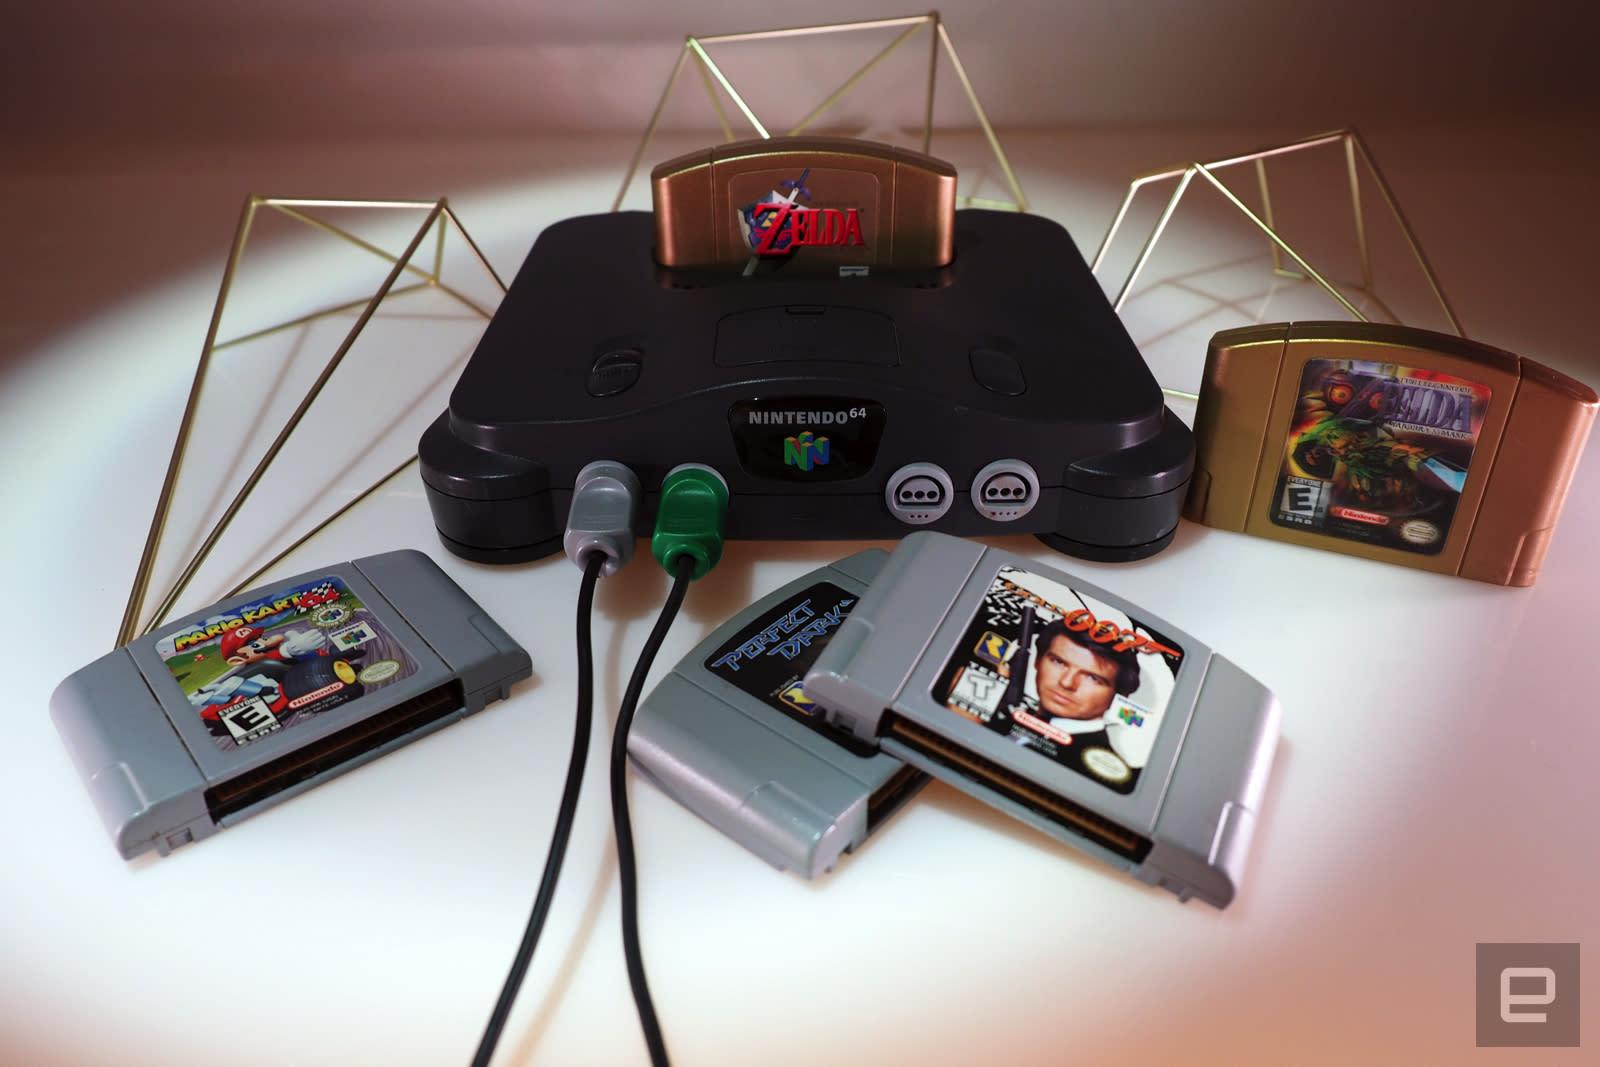 Nintendo 64 with Zelda, Mario Kart 64, Perfect Dark and GoldenEye 007